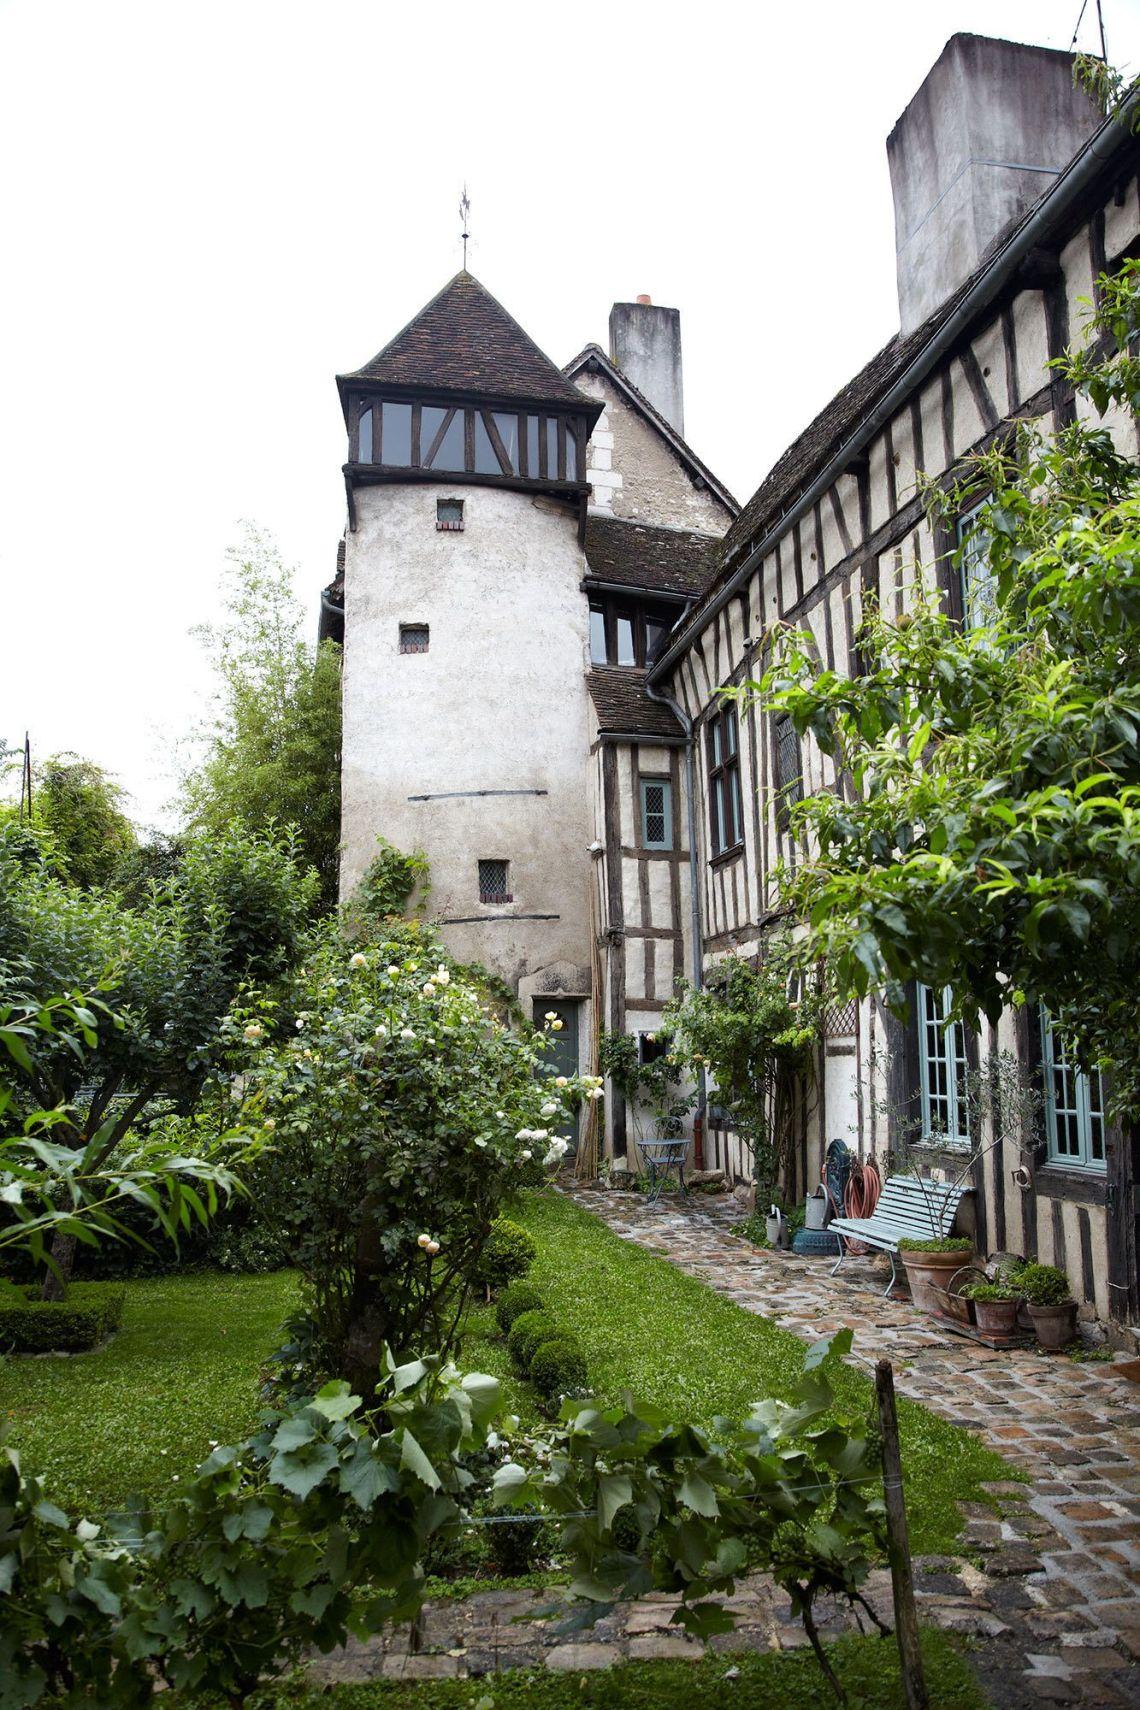 16th Century French Home - eaf63ab9334fd010de82fd36fd628c89_Simple 16th Century French Home - eaf63ab9334fd010de82fd36fd628c89  Image_563989.jpg